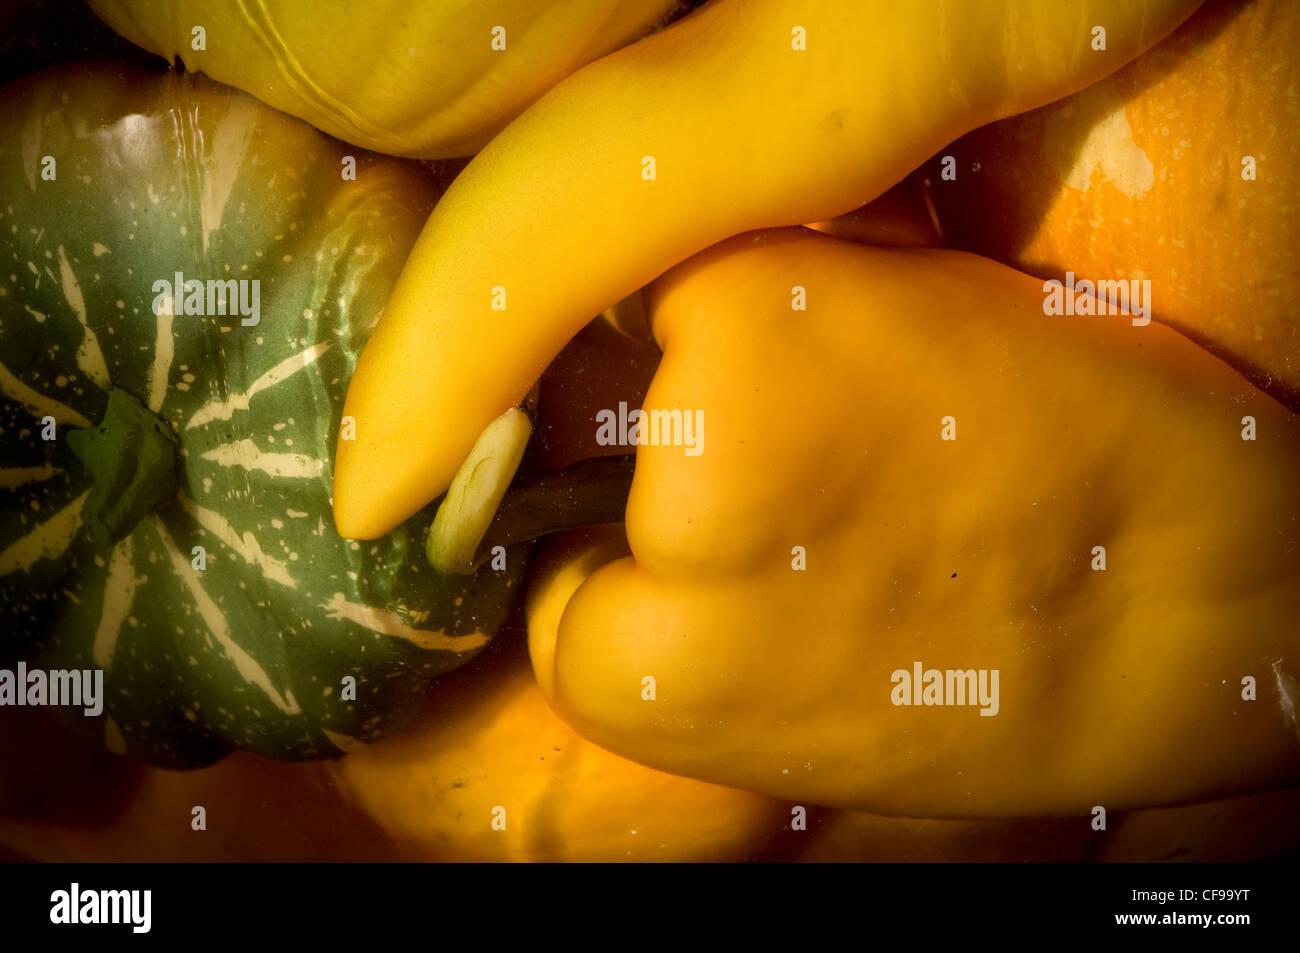 antioxidant, bell, black, calories, cayenne, chicken, chile, chili, chilli, color, corn, delicious, diet, fresh, - Stock Image